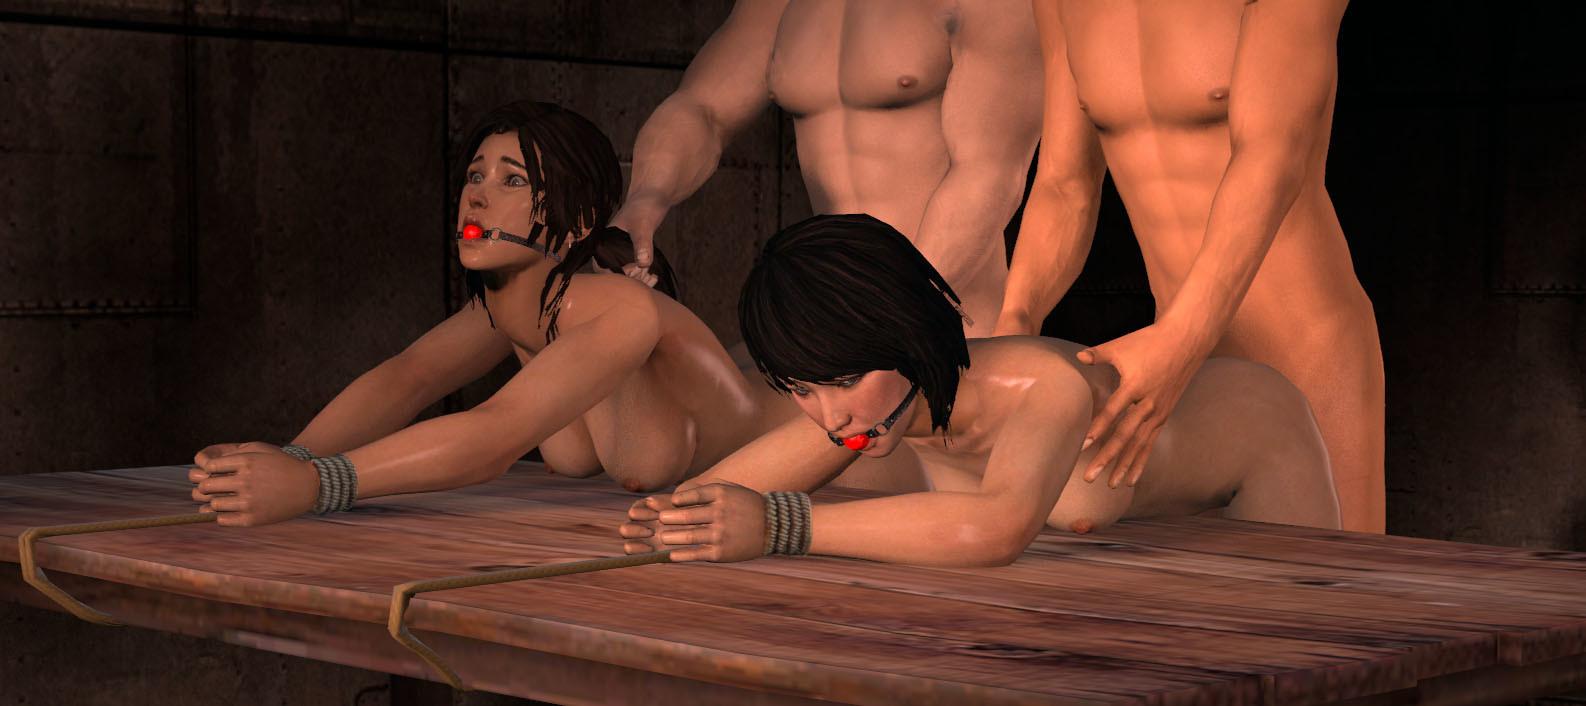 Tomb raider porn games